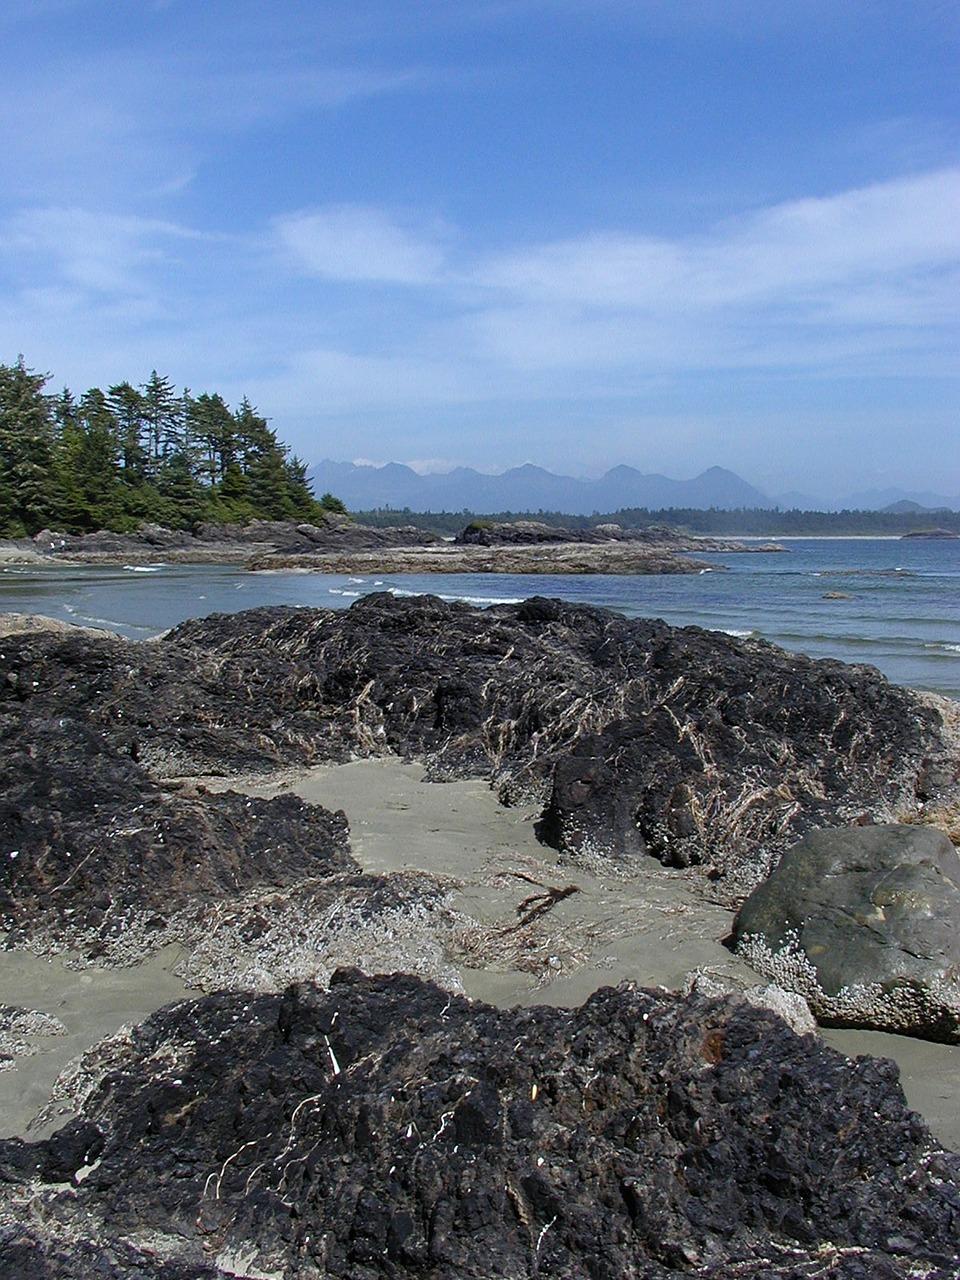 vancouver-island-57185_1280